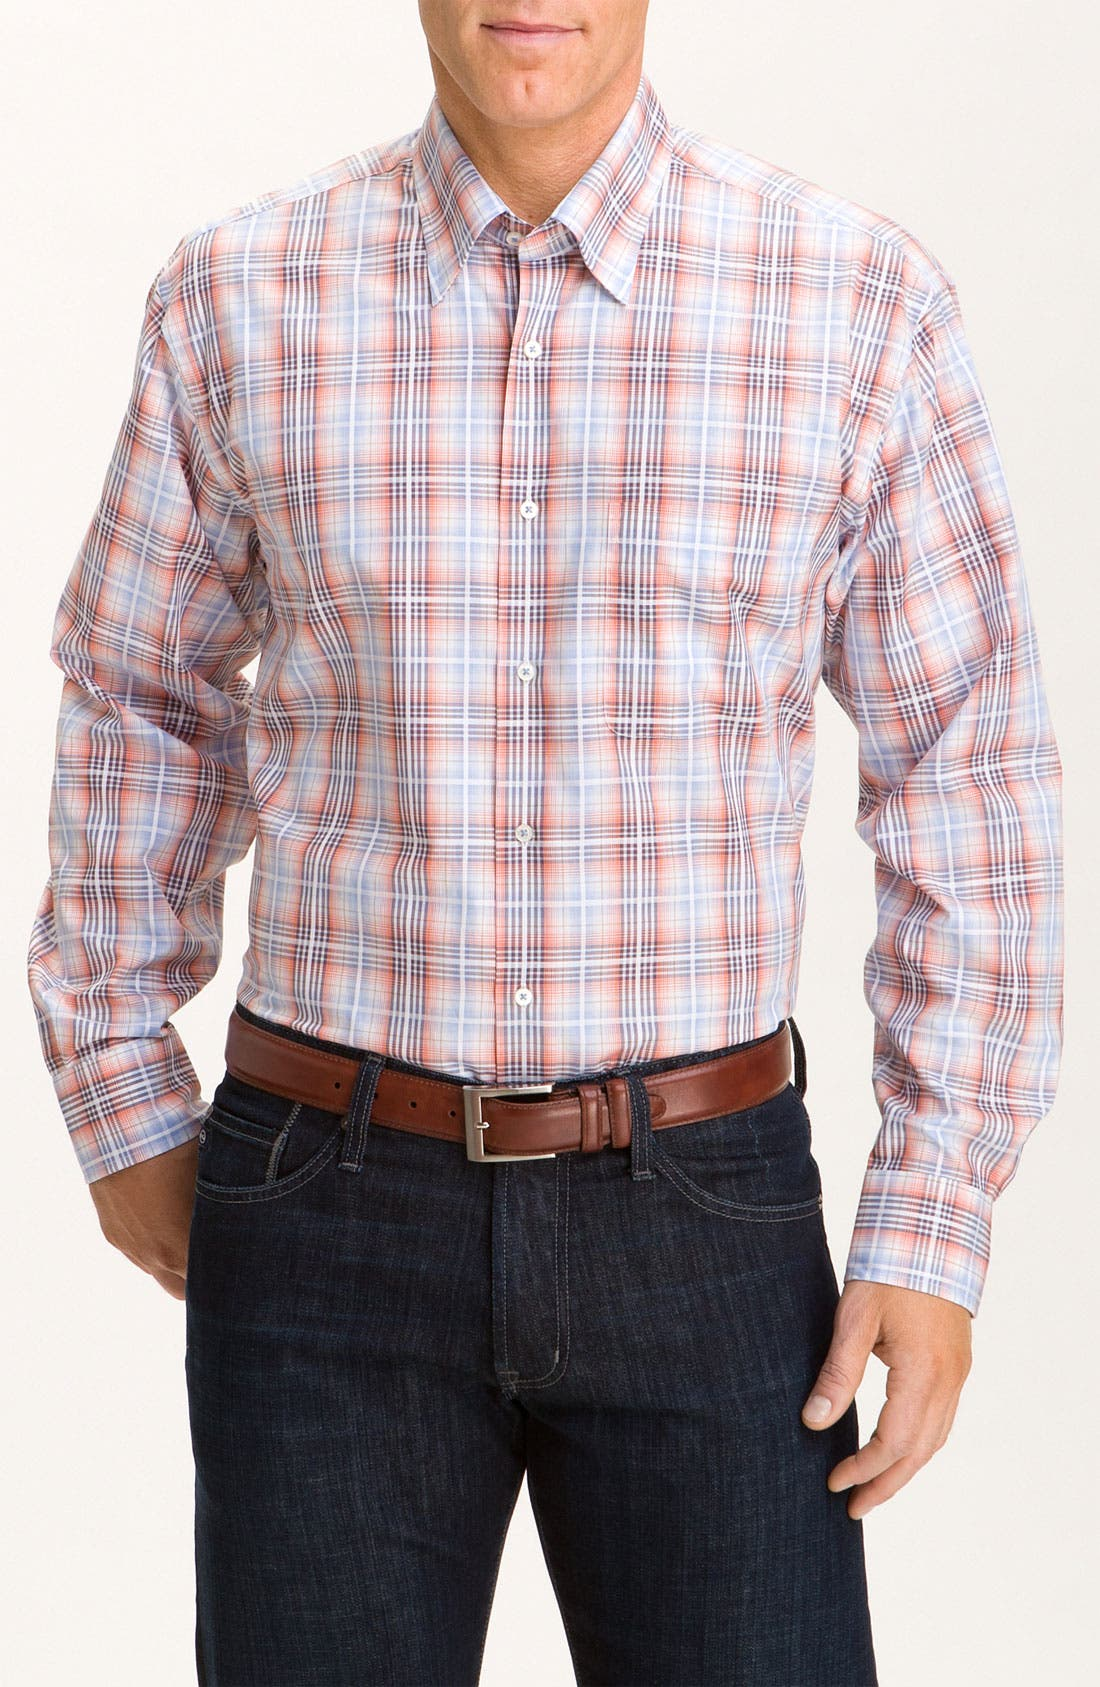 Alternate Image 1 Selected - Robert Talbott Plaid Sport Shirt